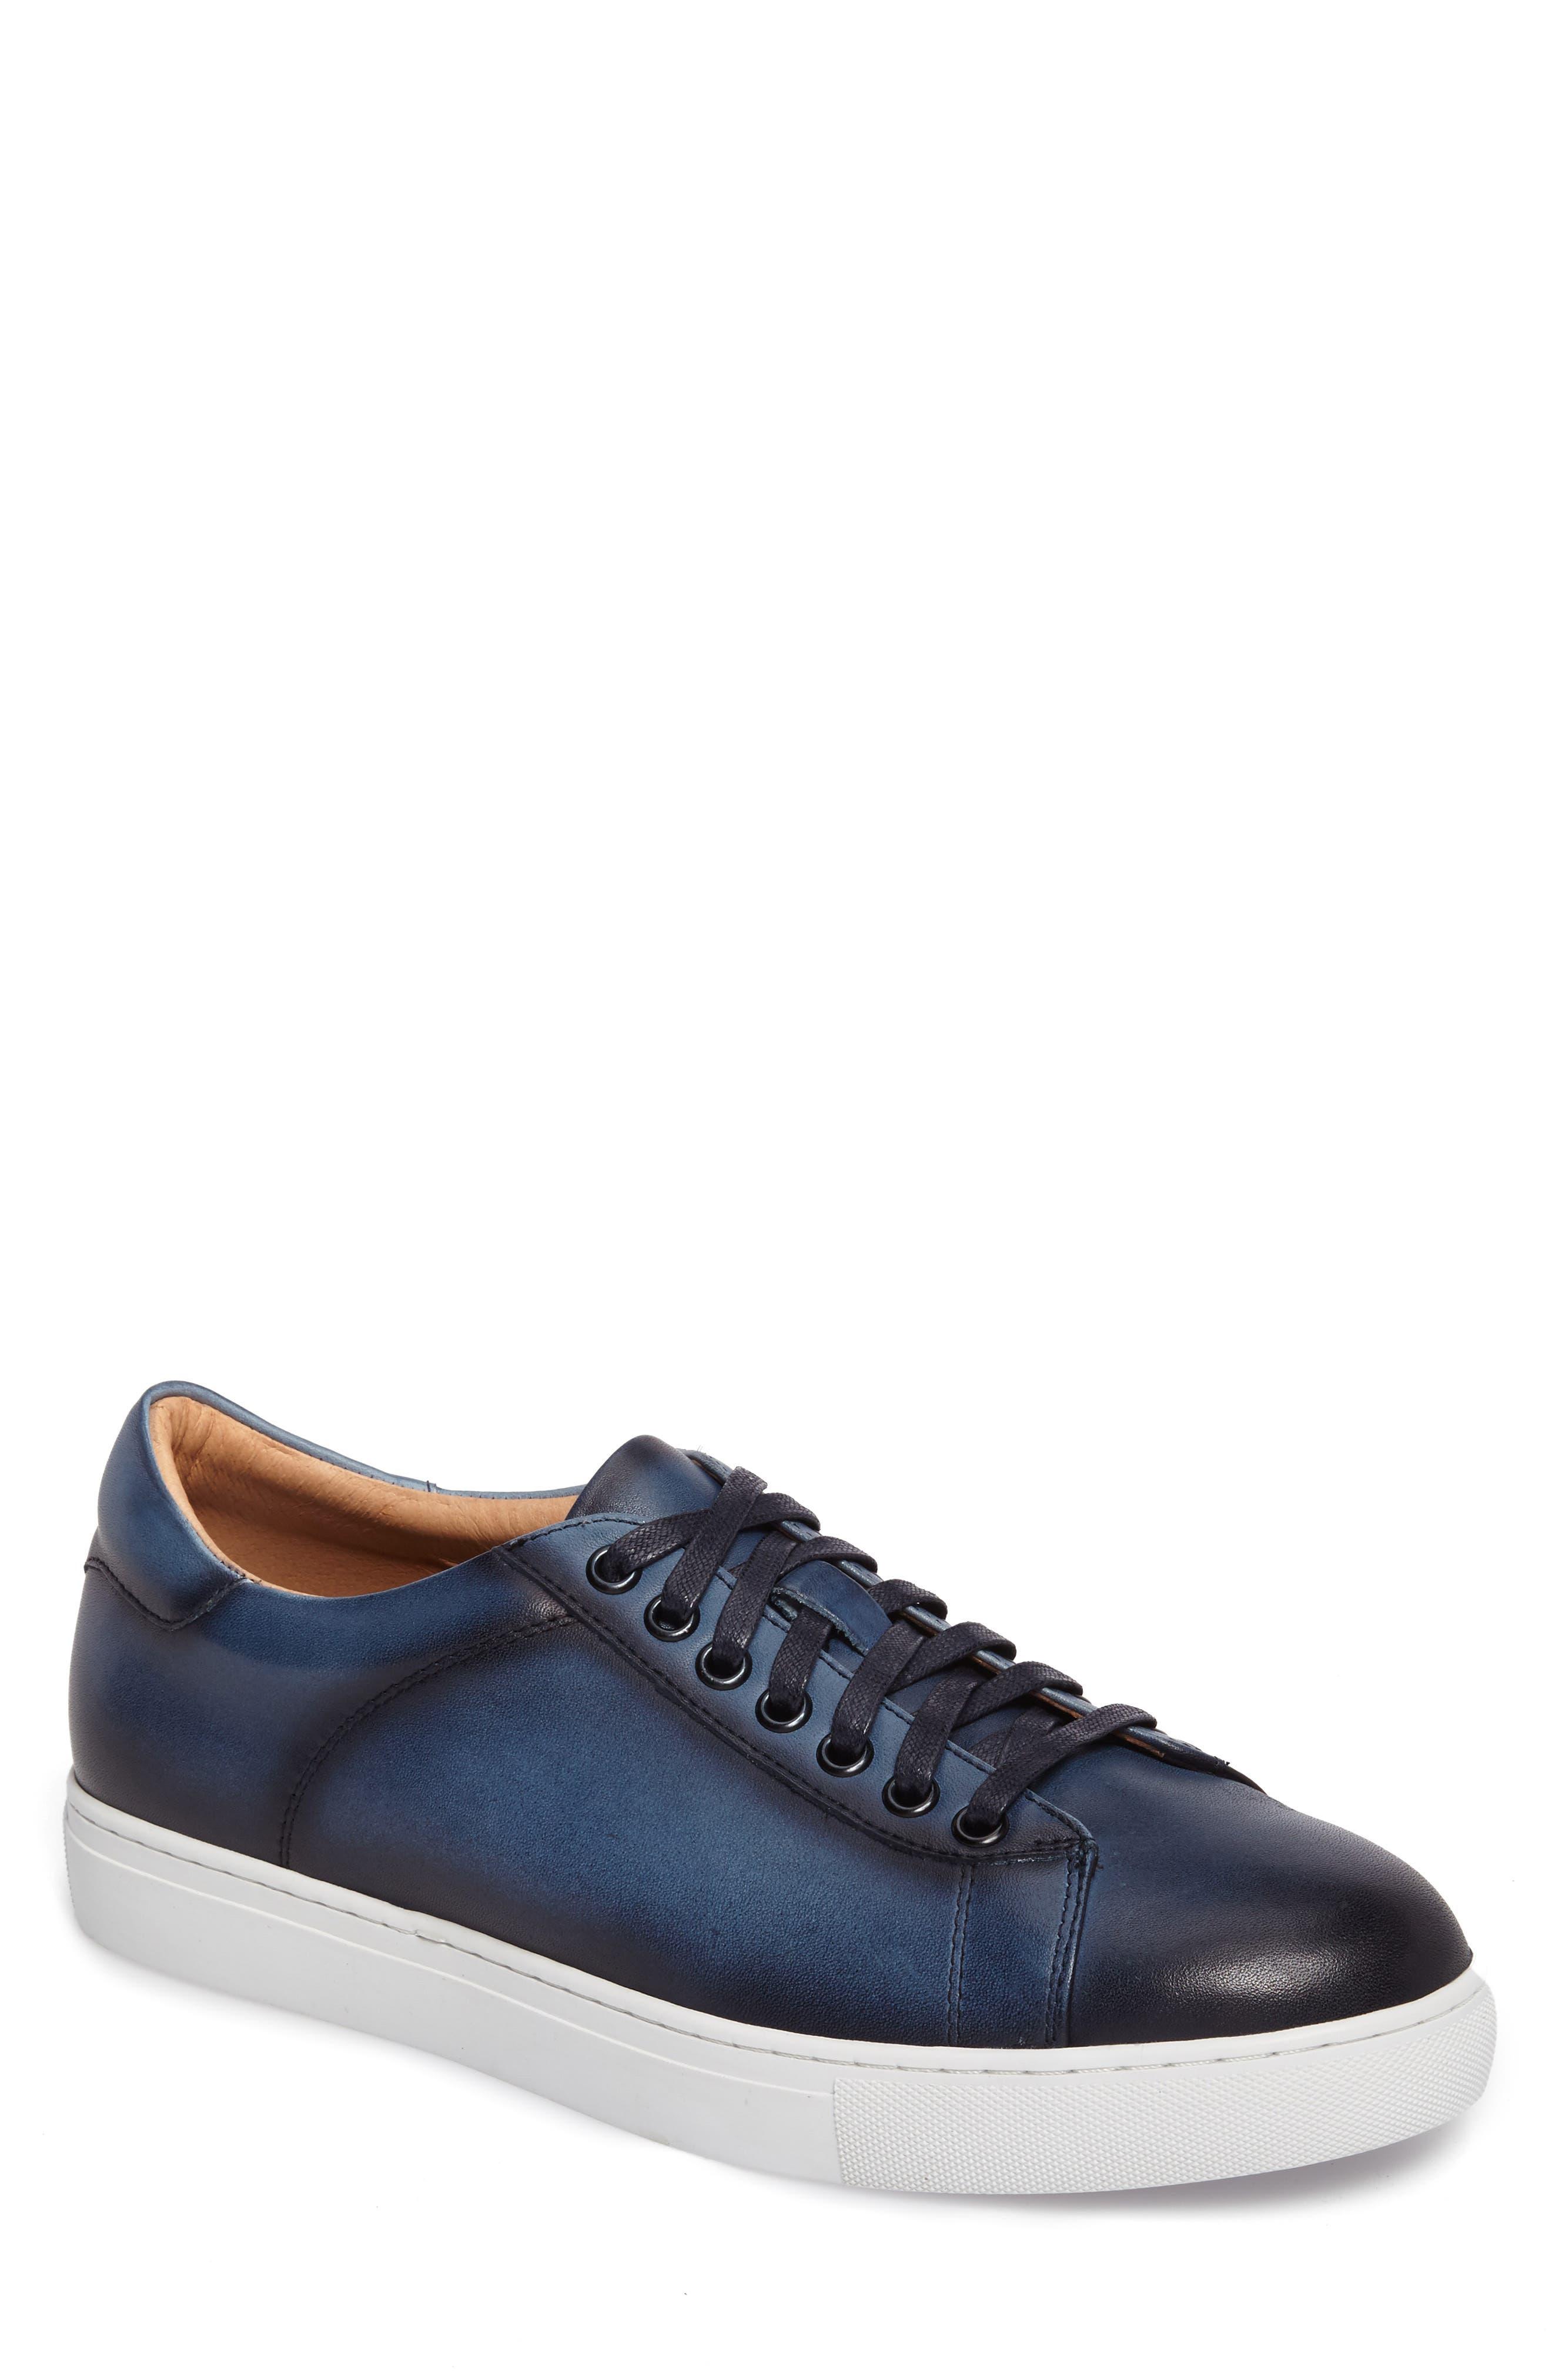 Penrose Sneaker,                         Main,                         color, Blue Leather